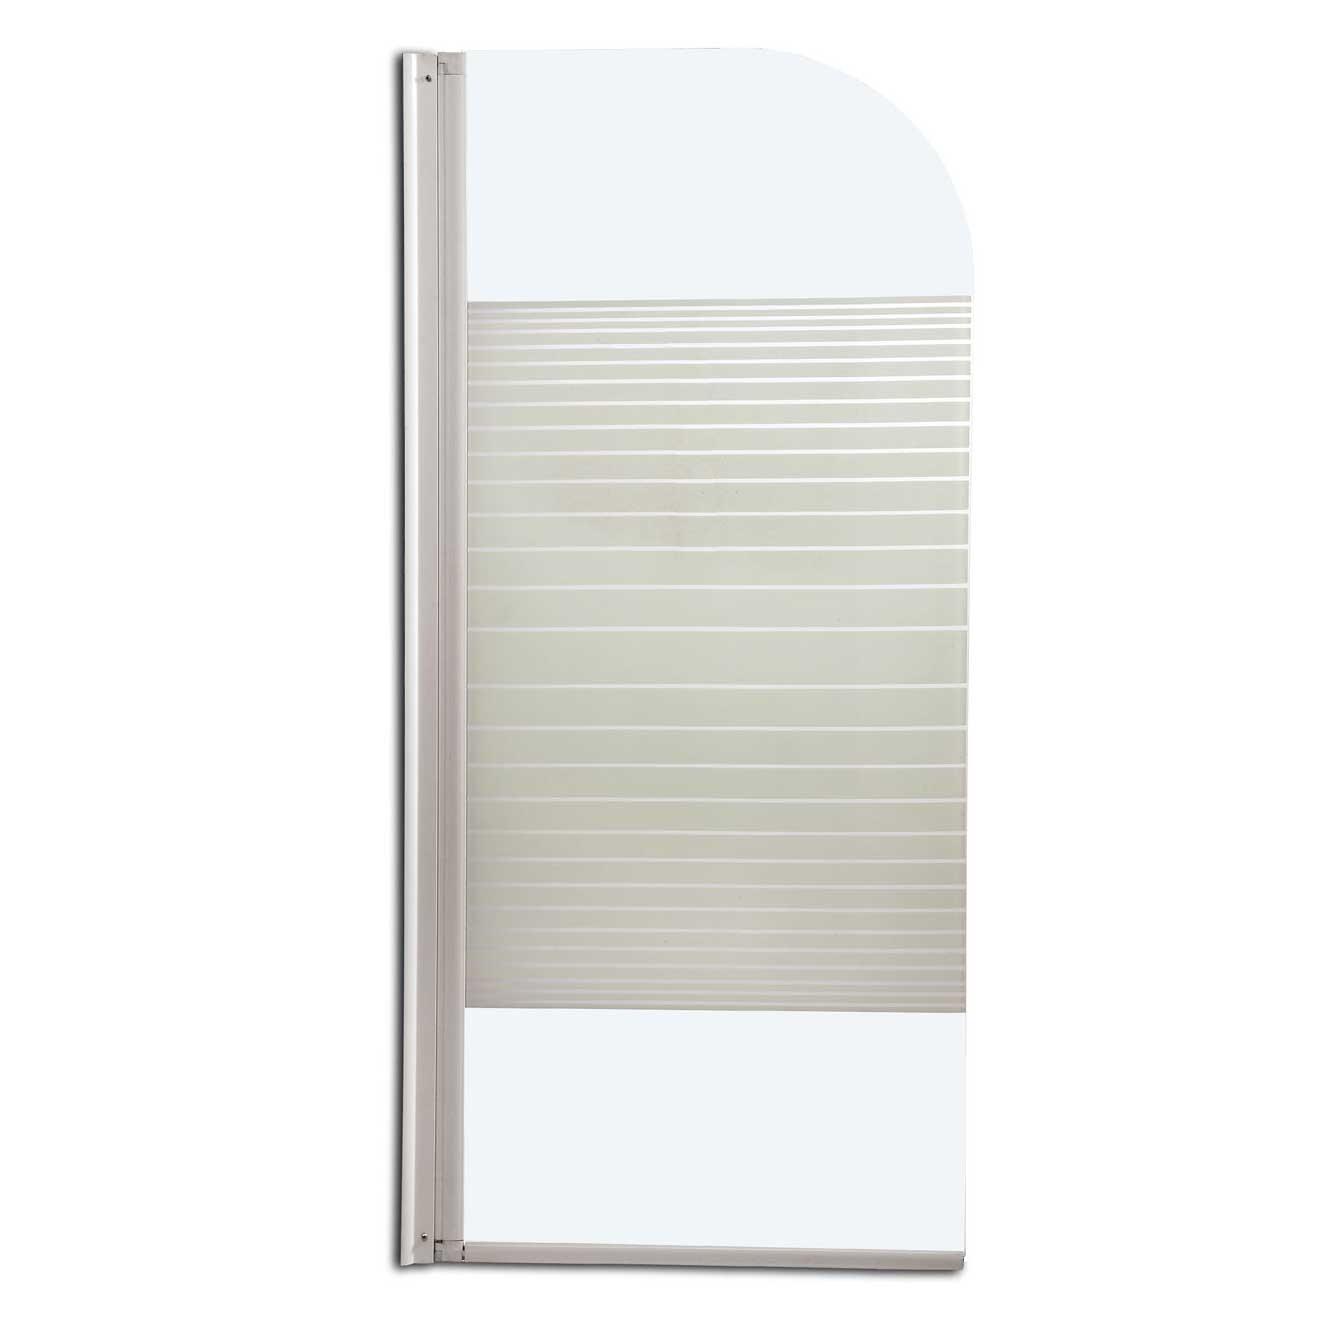 Paravan cada KDS - 7003, stanga / dreapta, 70 x 150 cm